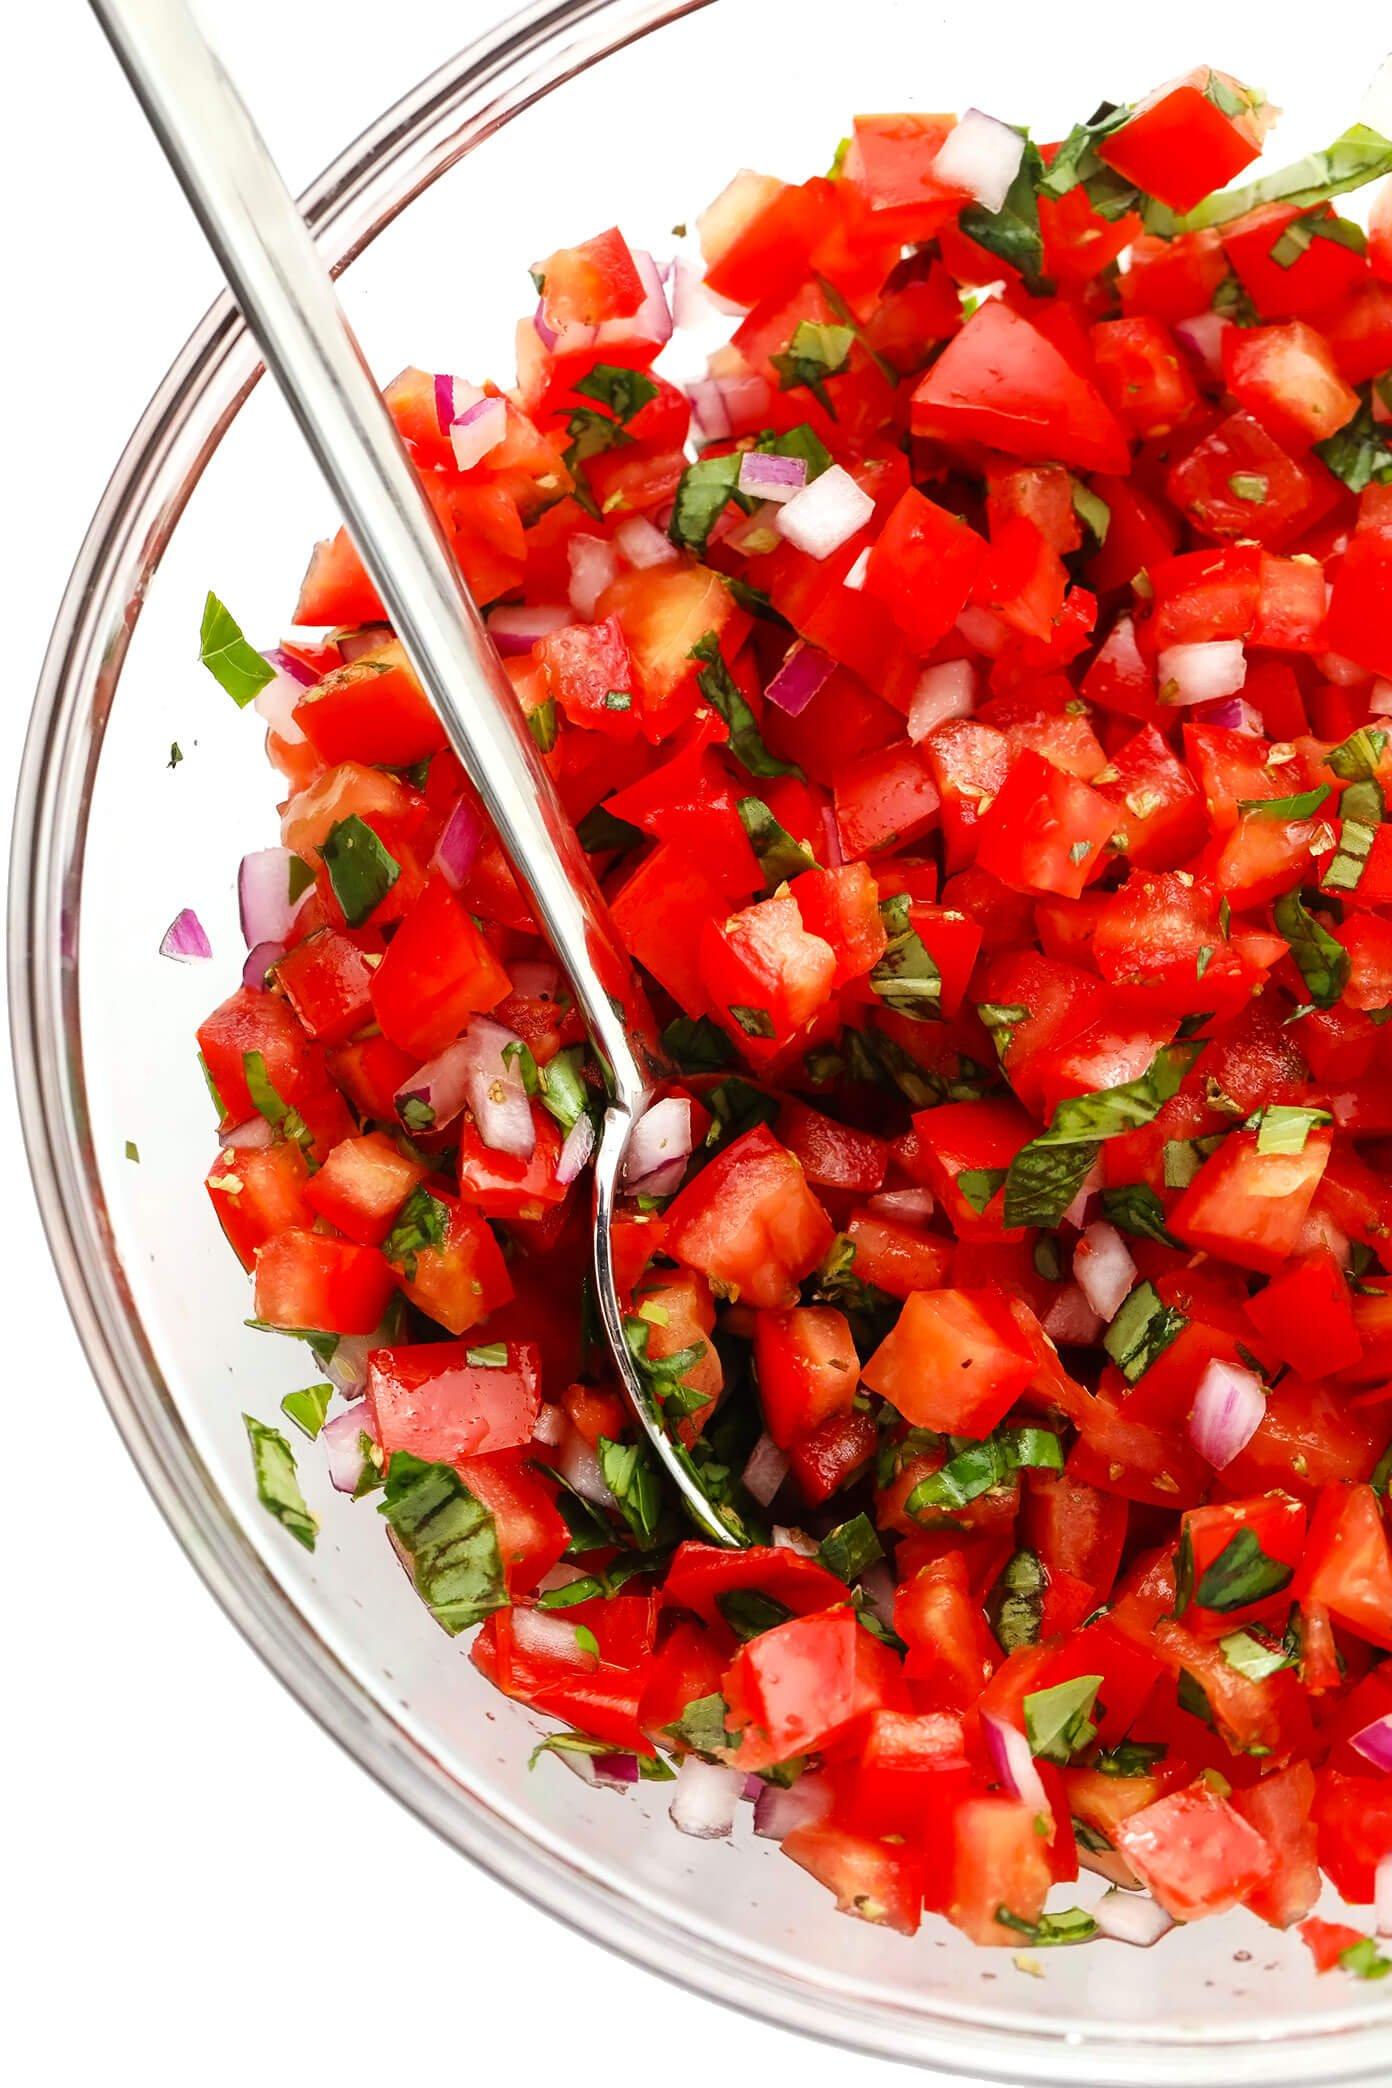 Tomato basil topping for bruschetta